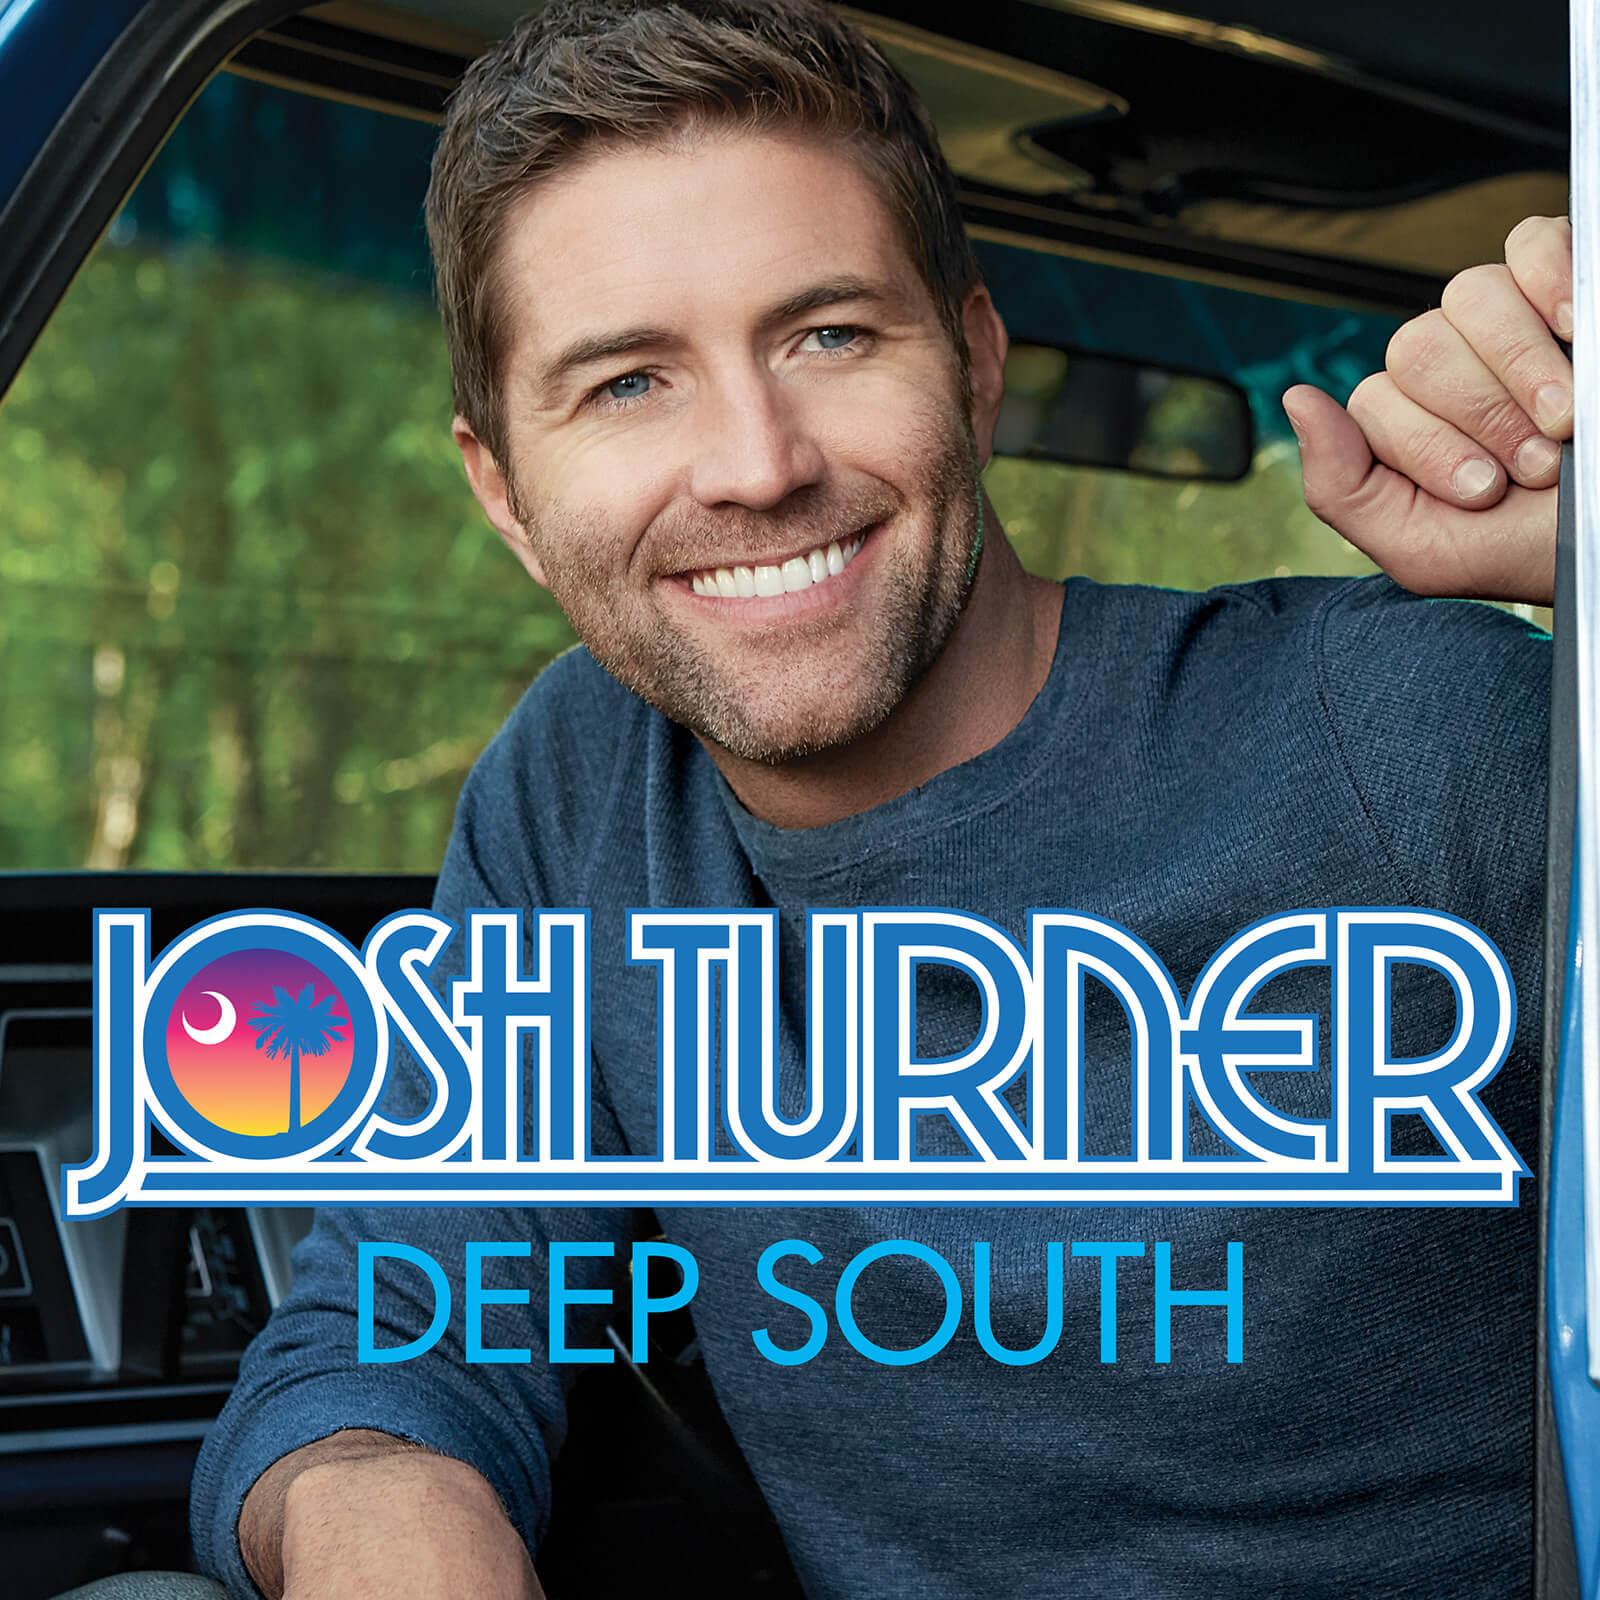 Josh Turner - Deep South CD